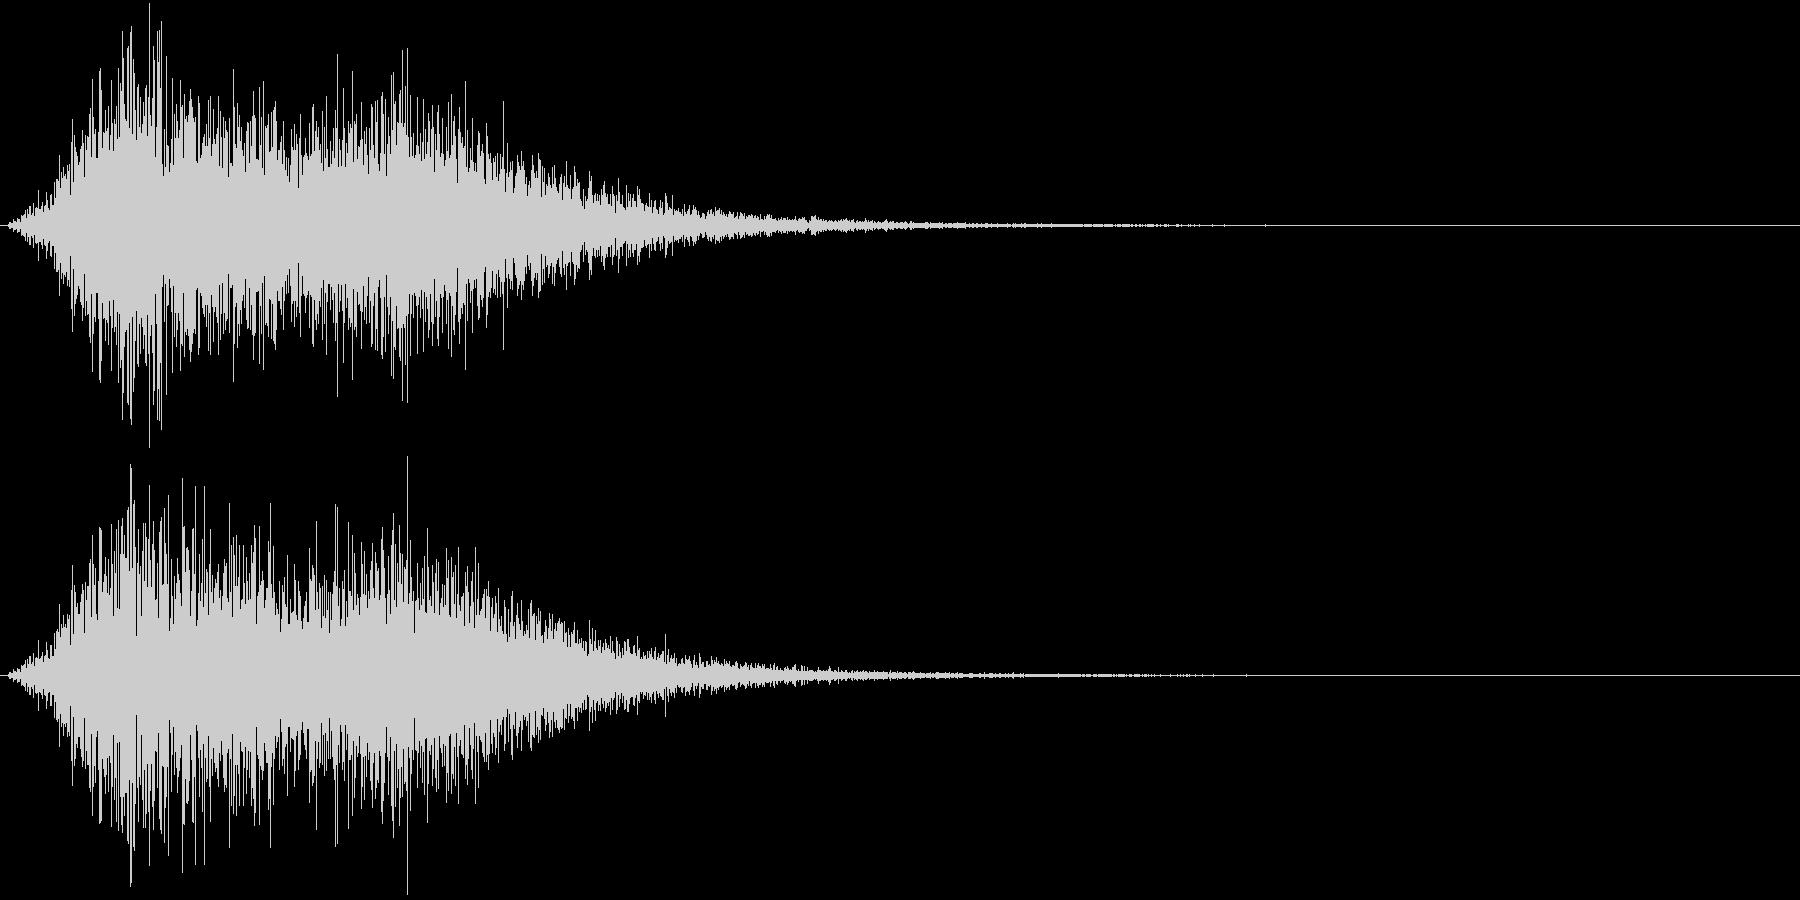 Battle 戦闘エフェクト音 5の未再生の波形